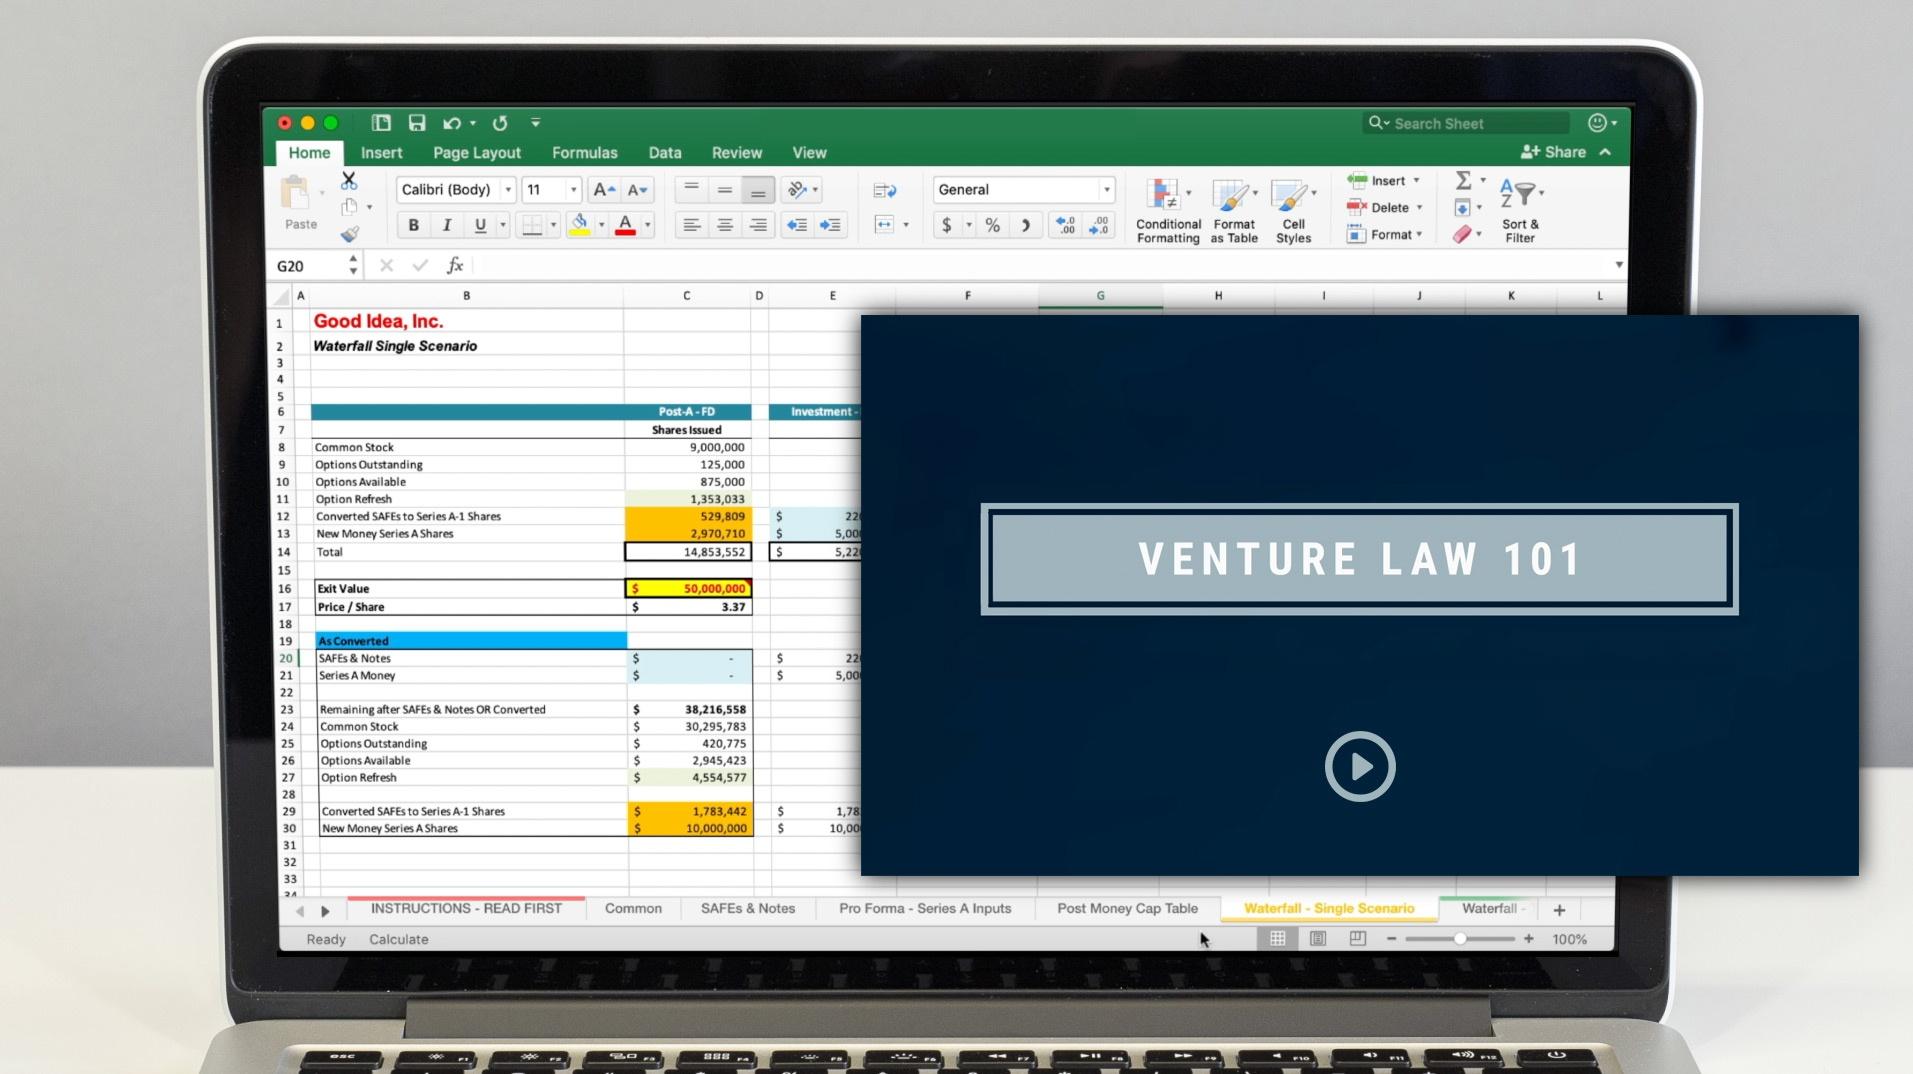 Venture Law 101 + Startup Cap Tables